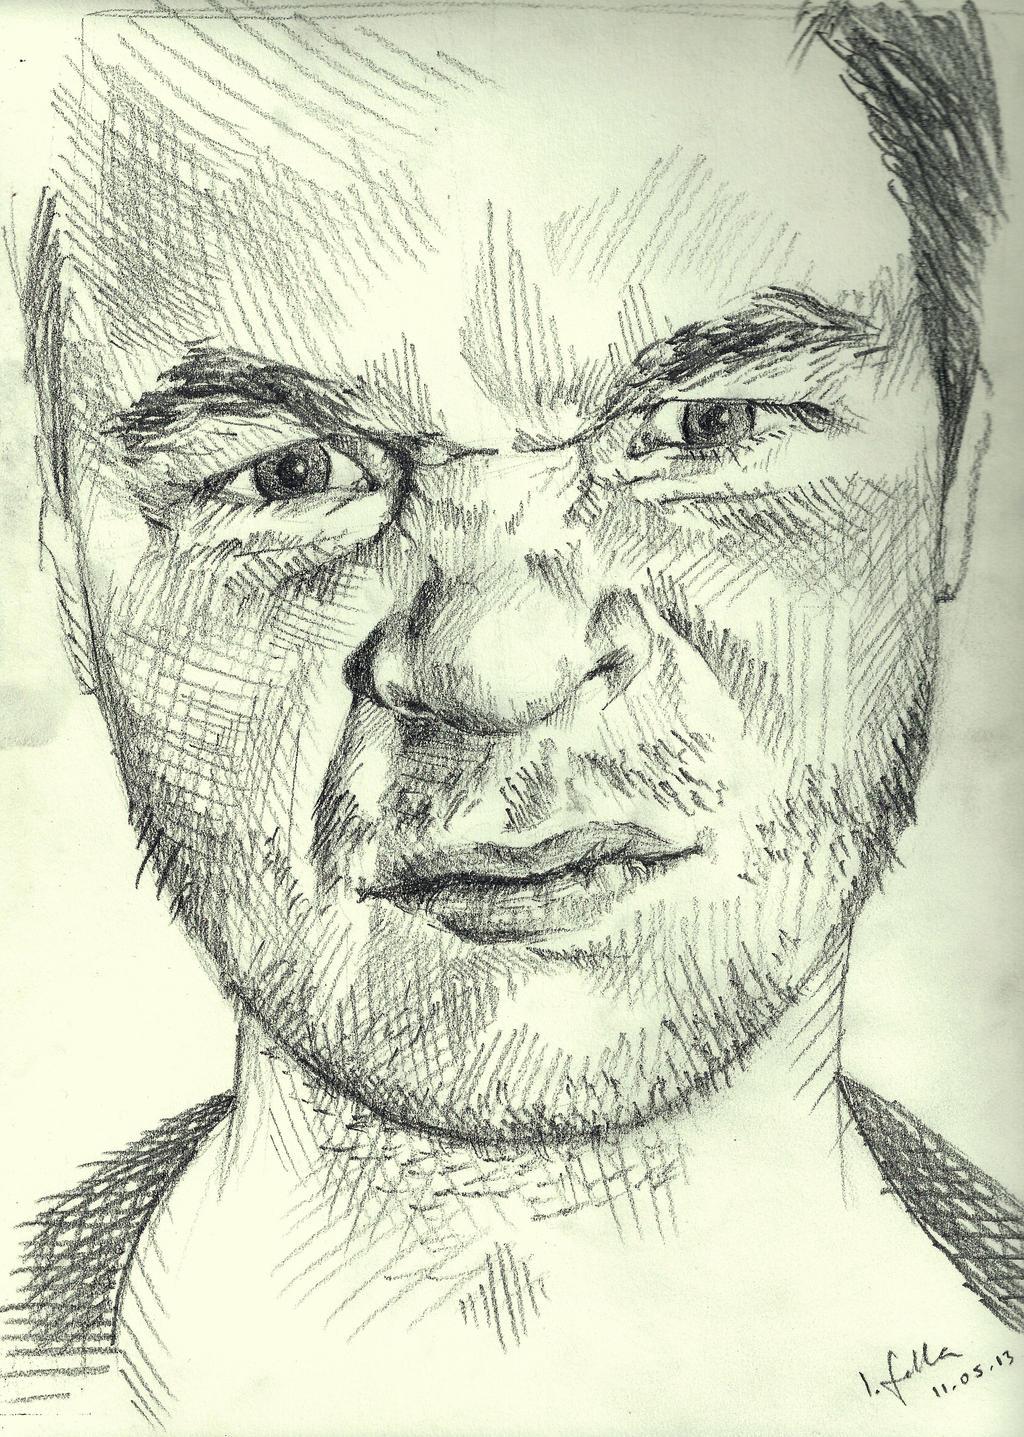 Quick Sketch 14 - Crinkle Face Man By Spots-of-tea On DeviantART